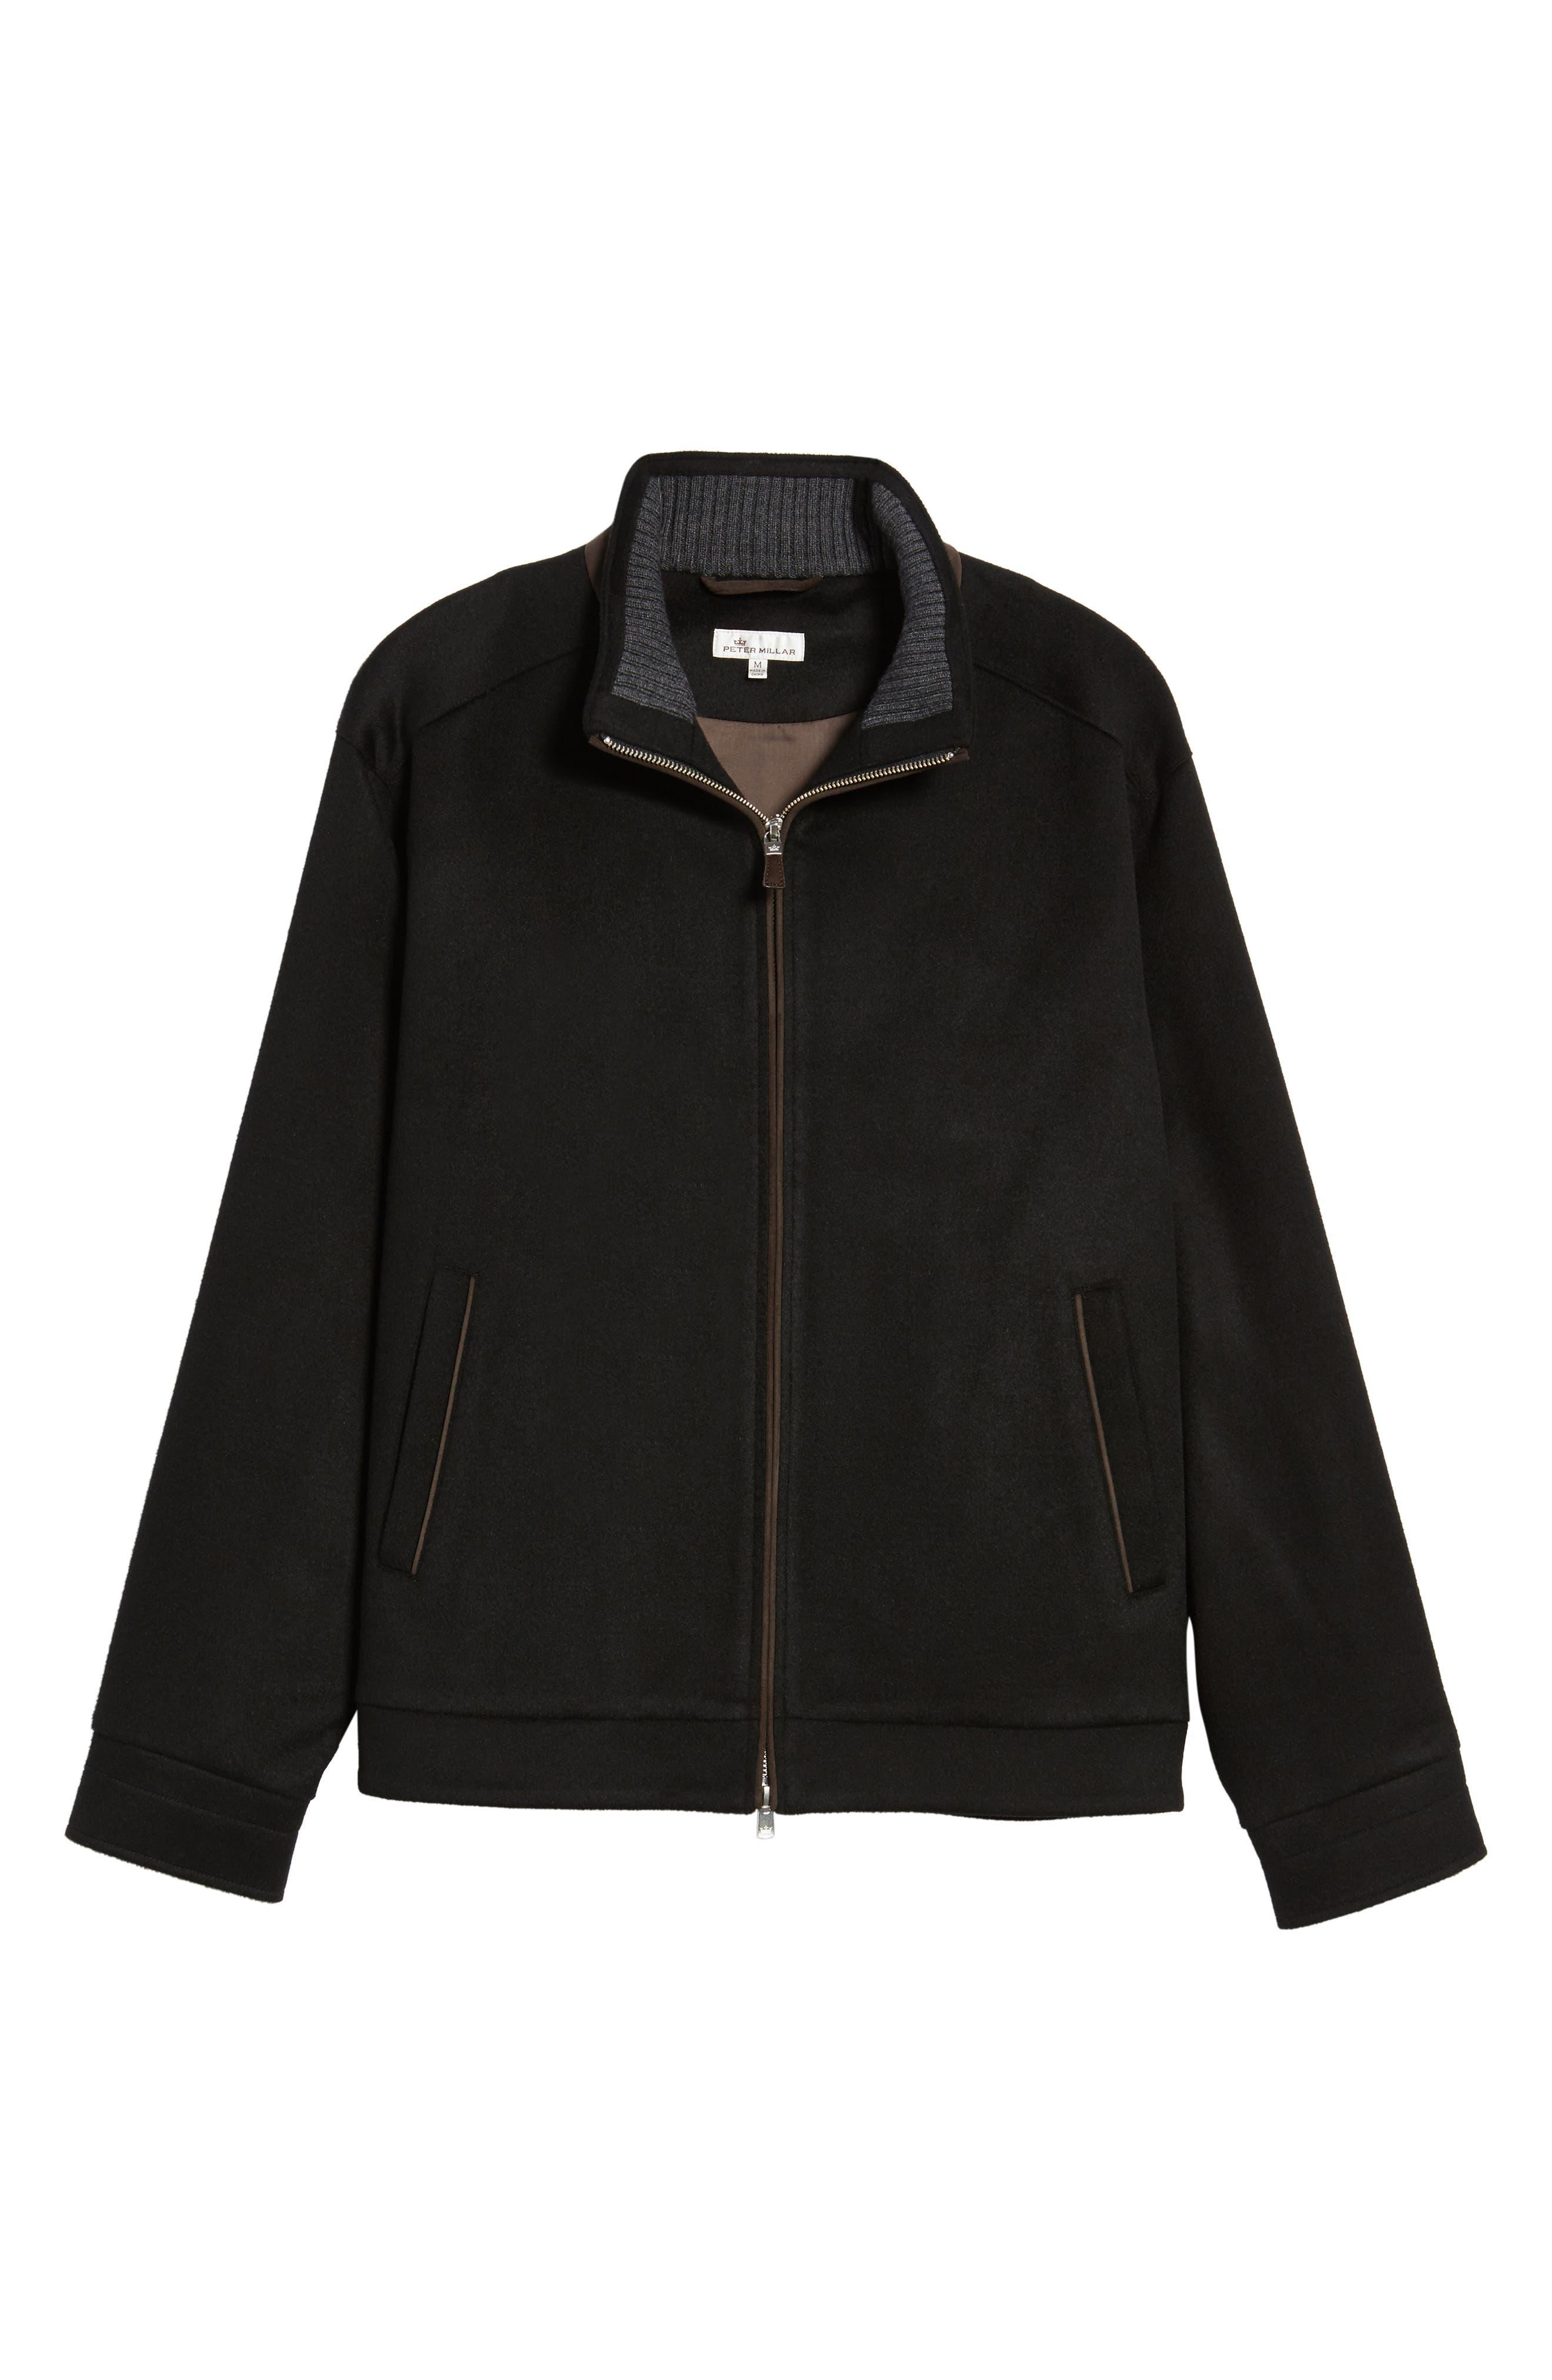 Westport Wool & Cashmere Jacket,                             Alternate thumbnail 13, color,